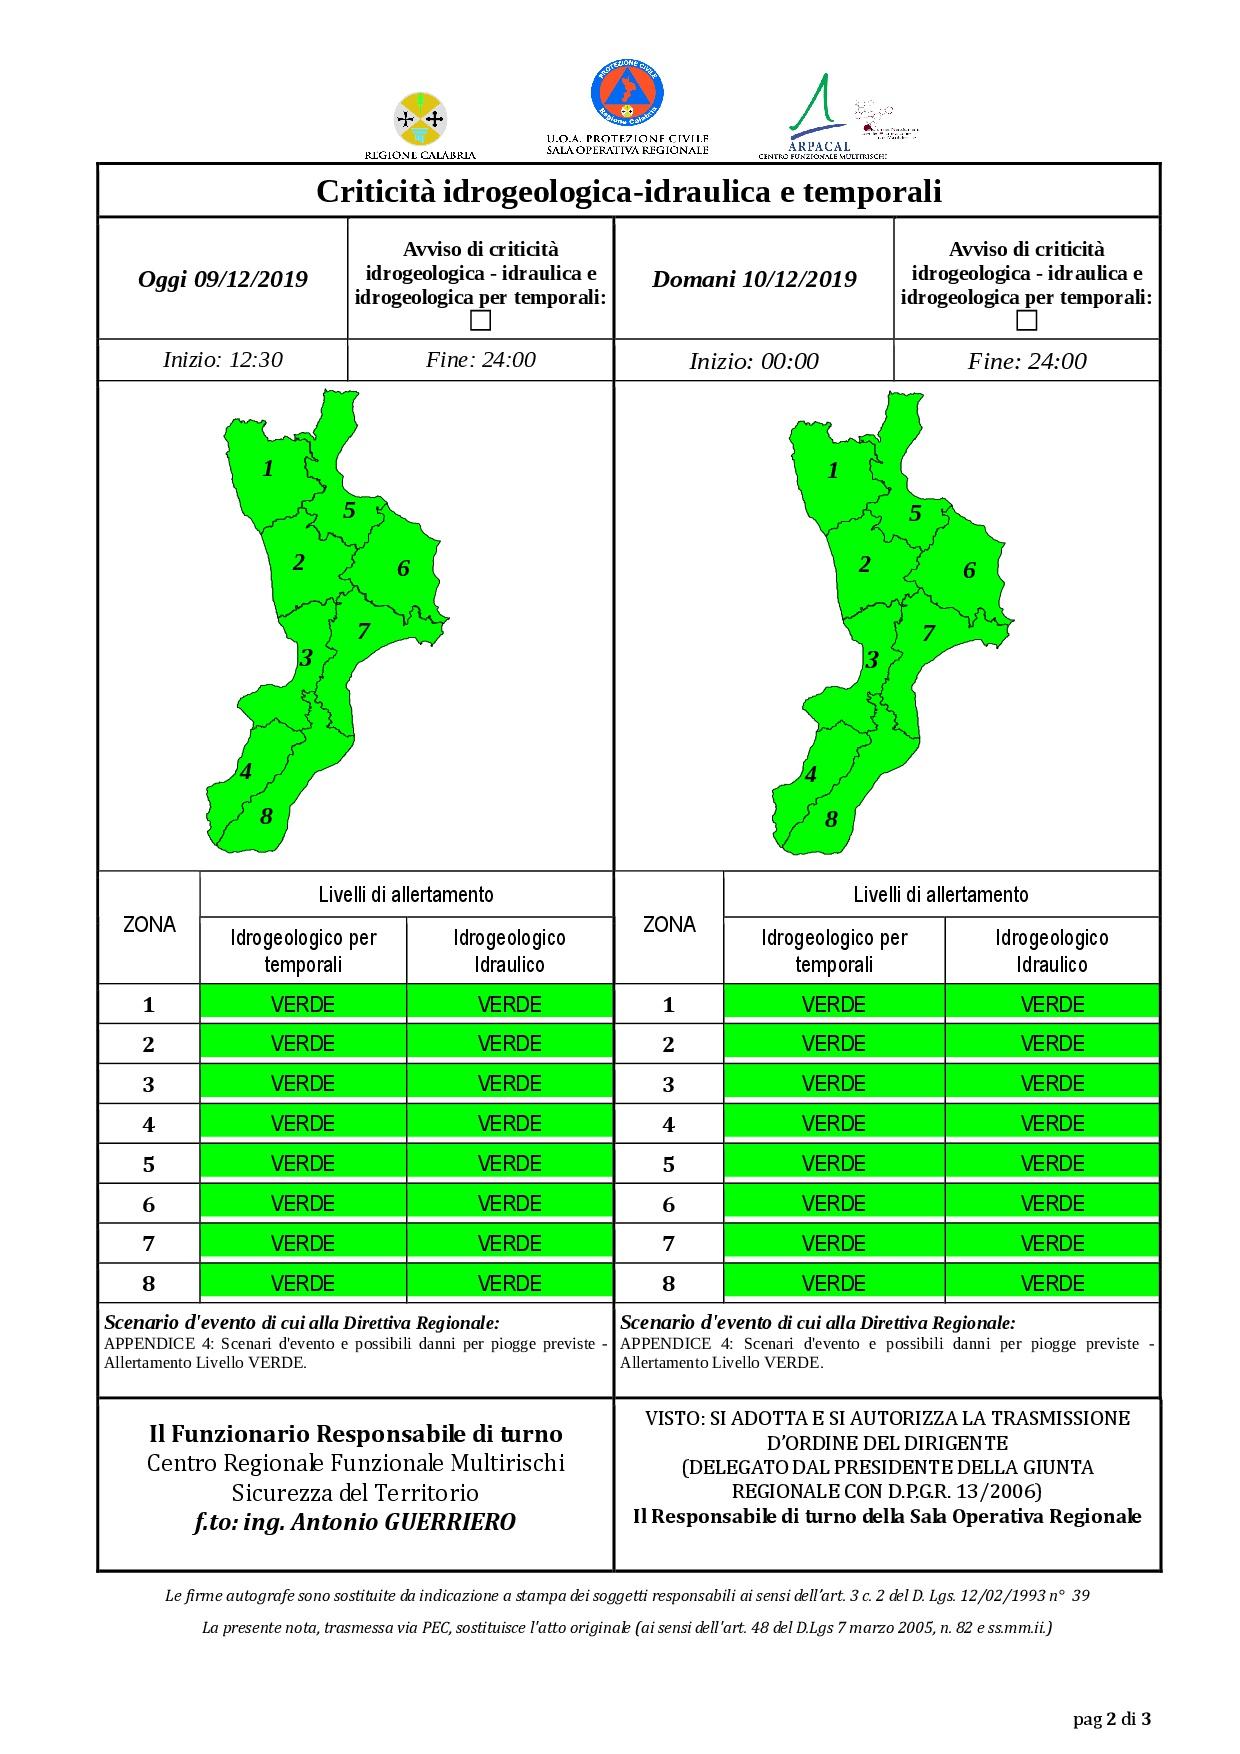 Criticità idrogeologica-idraulica e temporali in Calabria 09-12-2019